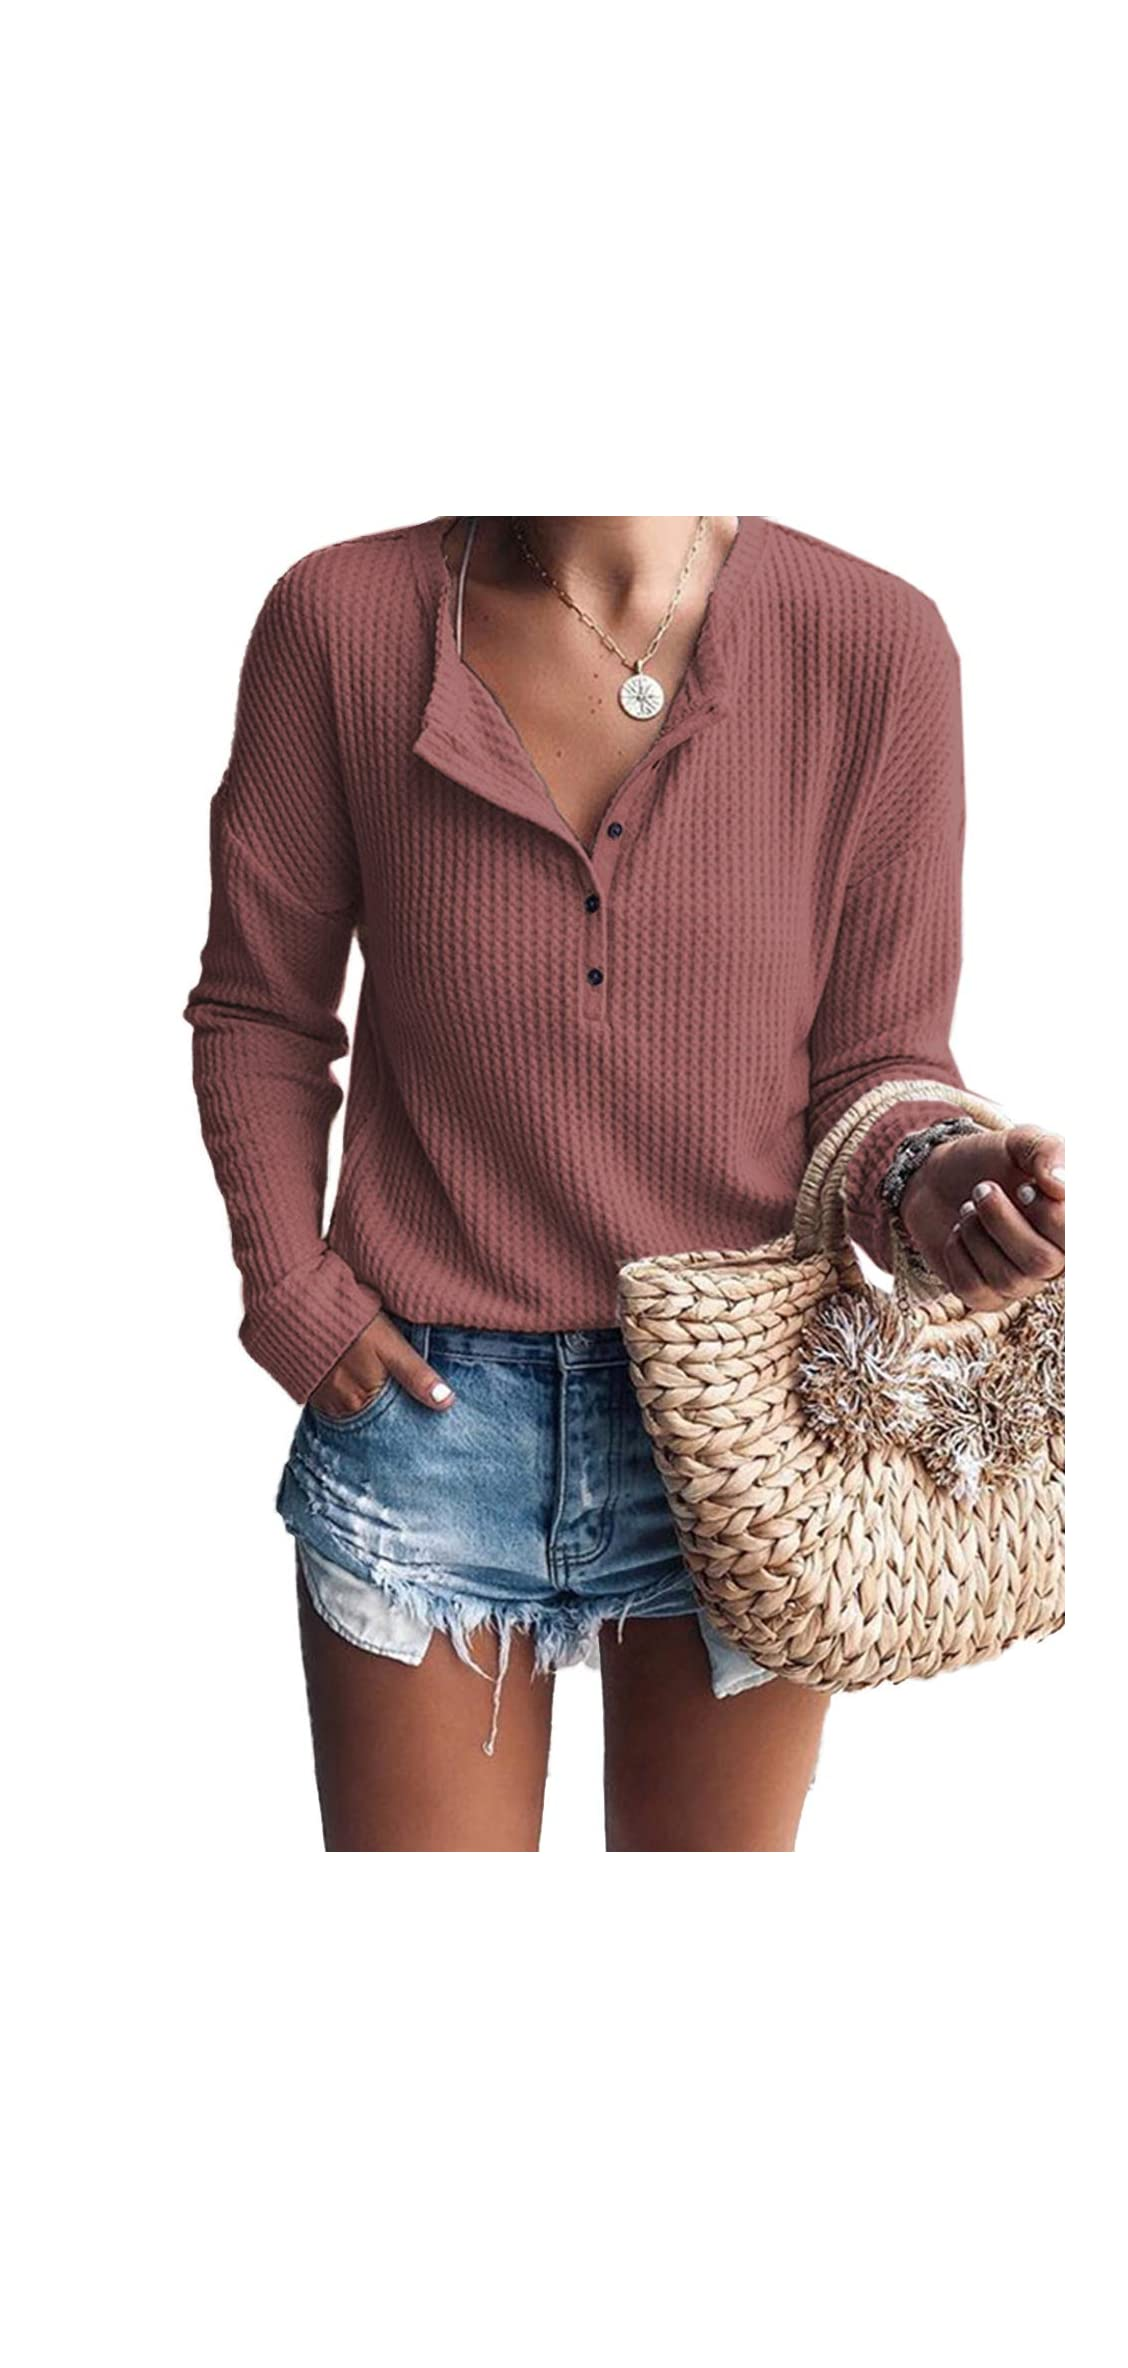 Women's Waffle Knit Tunic Tops Loose Long Sleeve Button